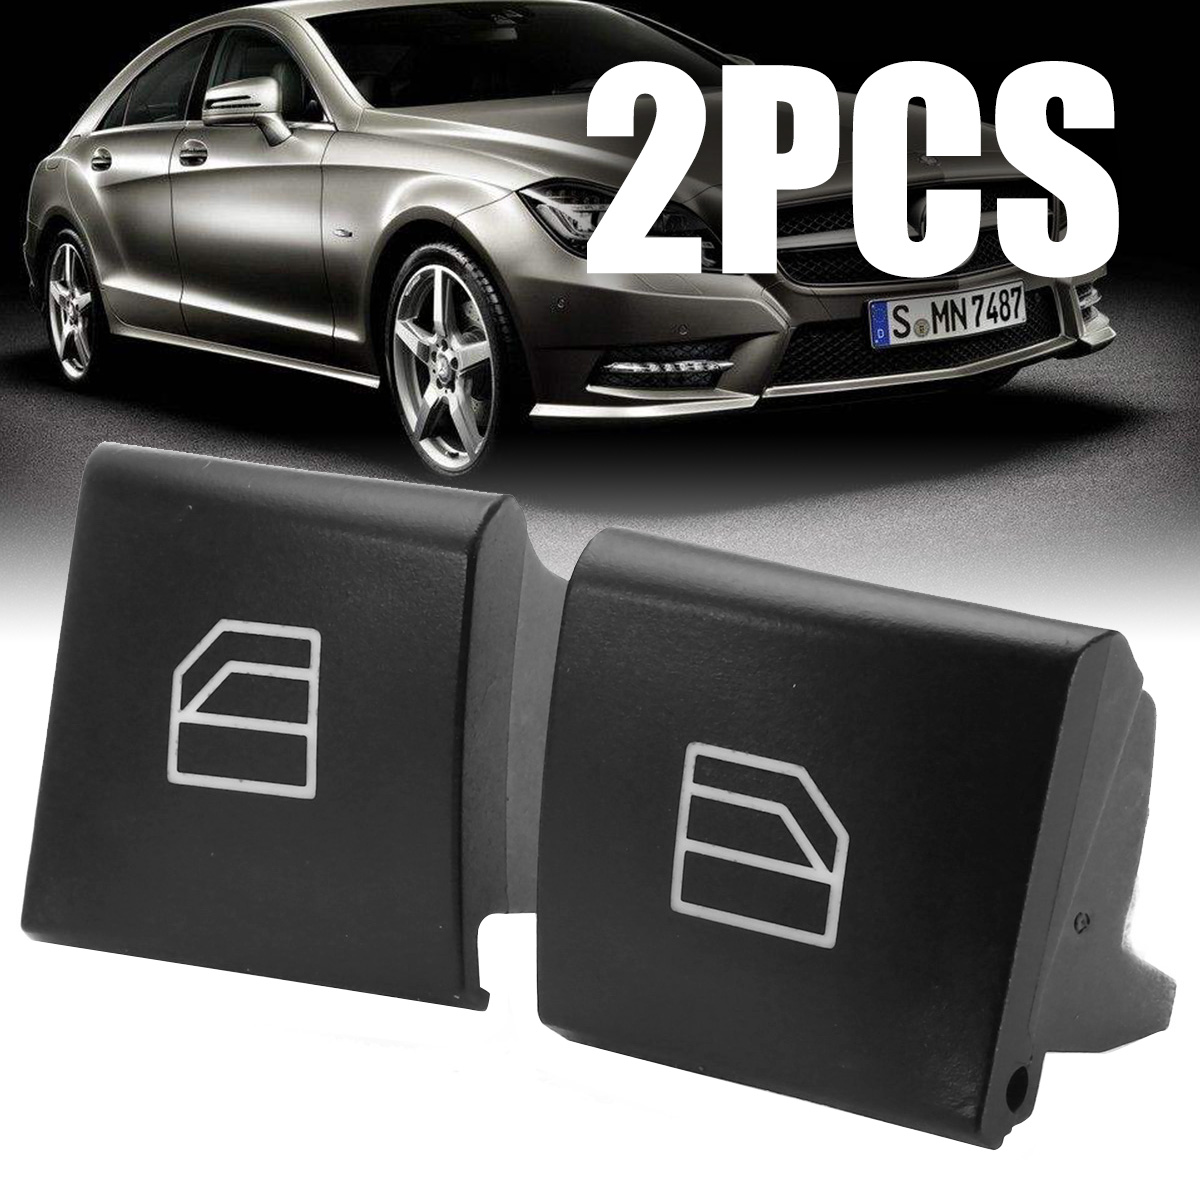 1Pair Automobile Window Switch Car Driver Repair Button Cap Control For Mercedes ML GL R Class W164 X164 W251